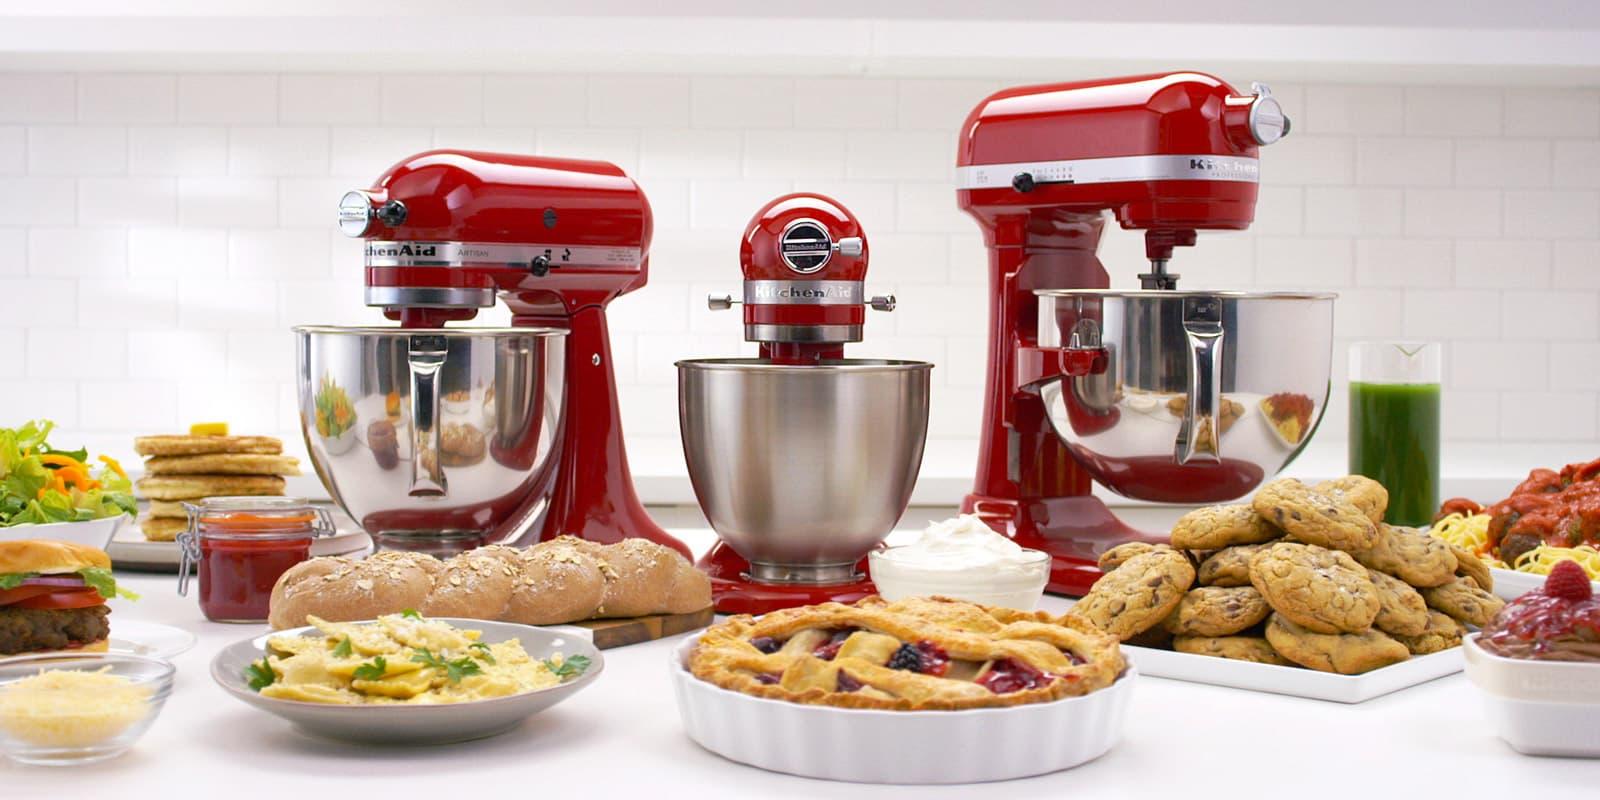 Kitchenaid Artisan 5ksm150pseer - Kitchen Appliances Tips And Review